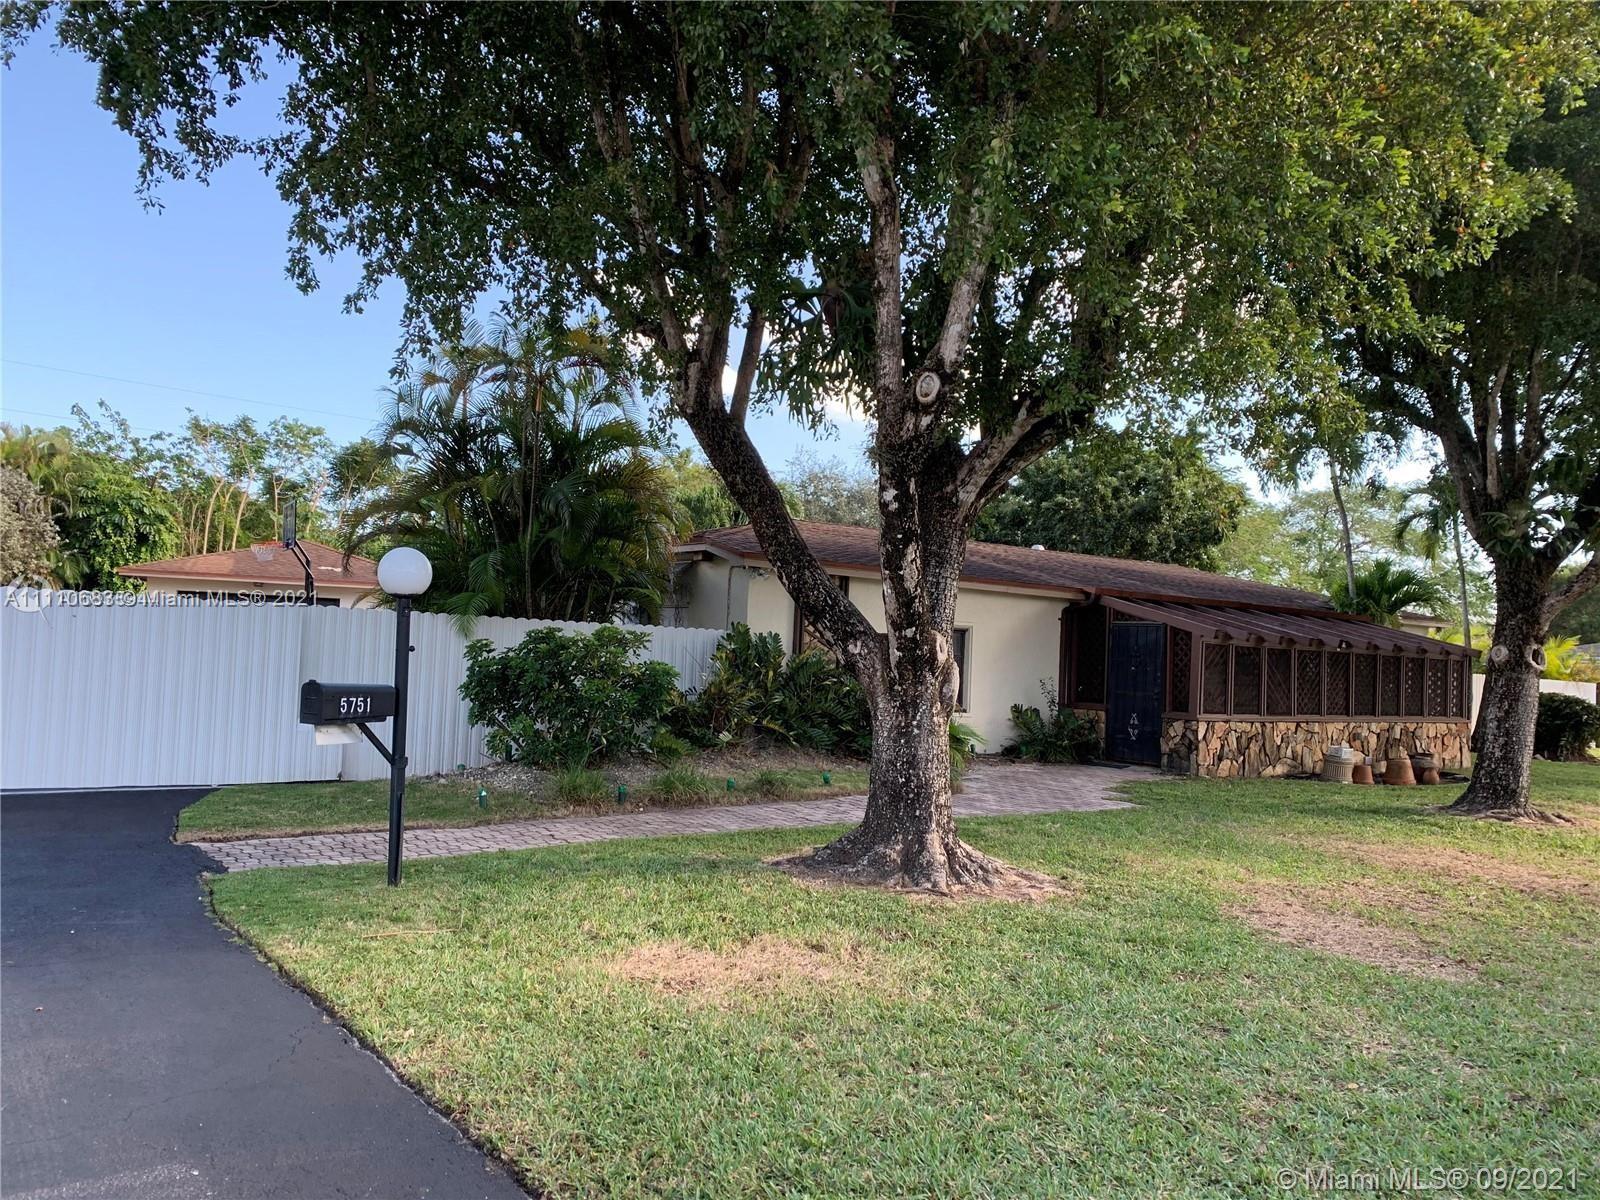 Single Family Home,For Sale,5751 SW 74th Ct, Miami, Florida 33143,Brickell,realty,broker,condos near me